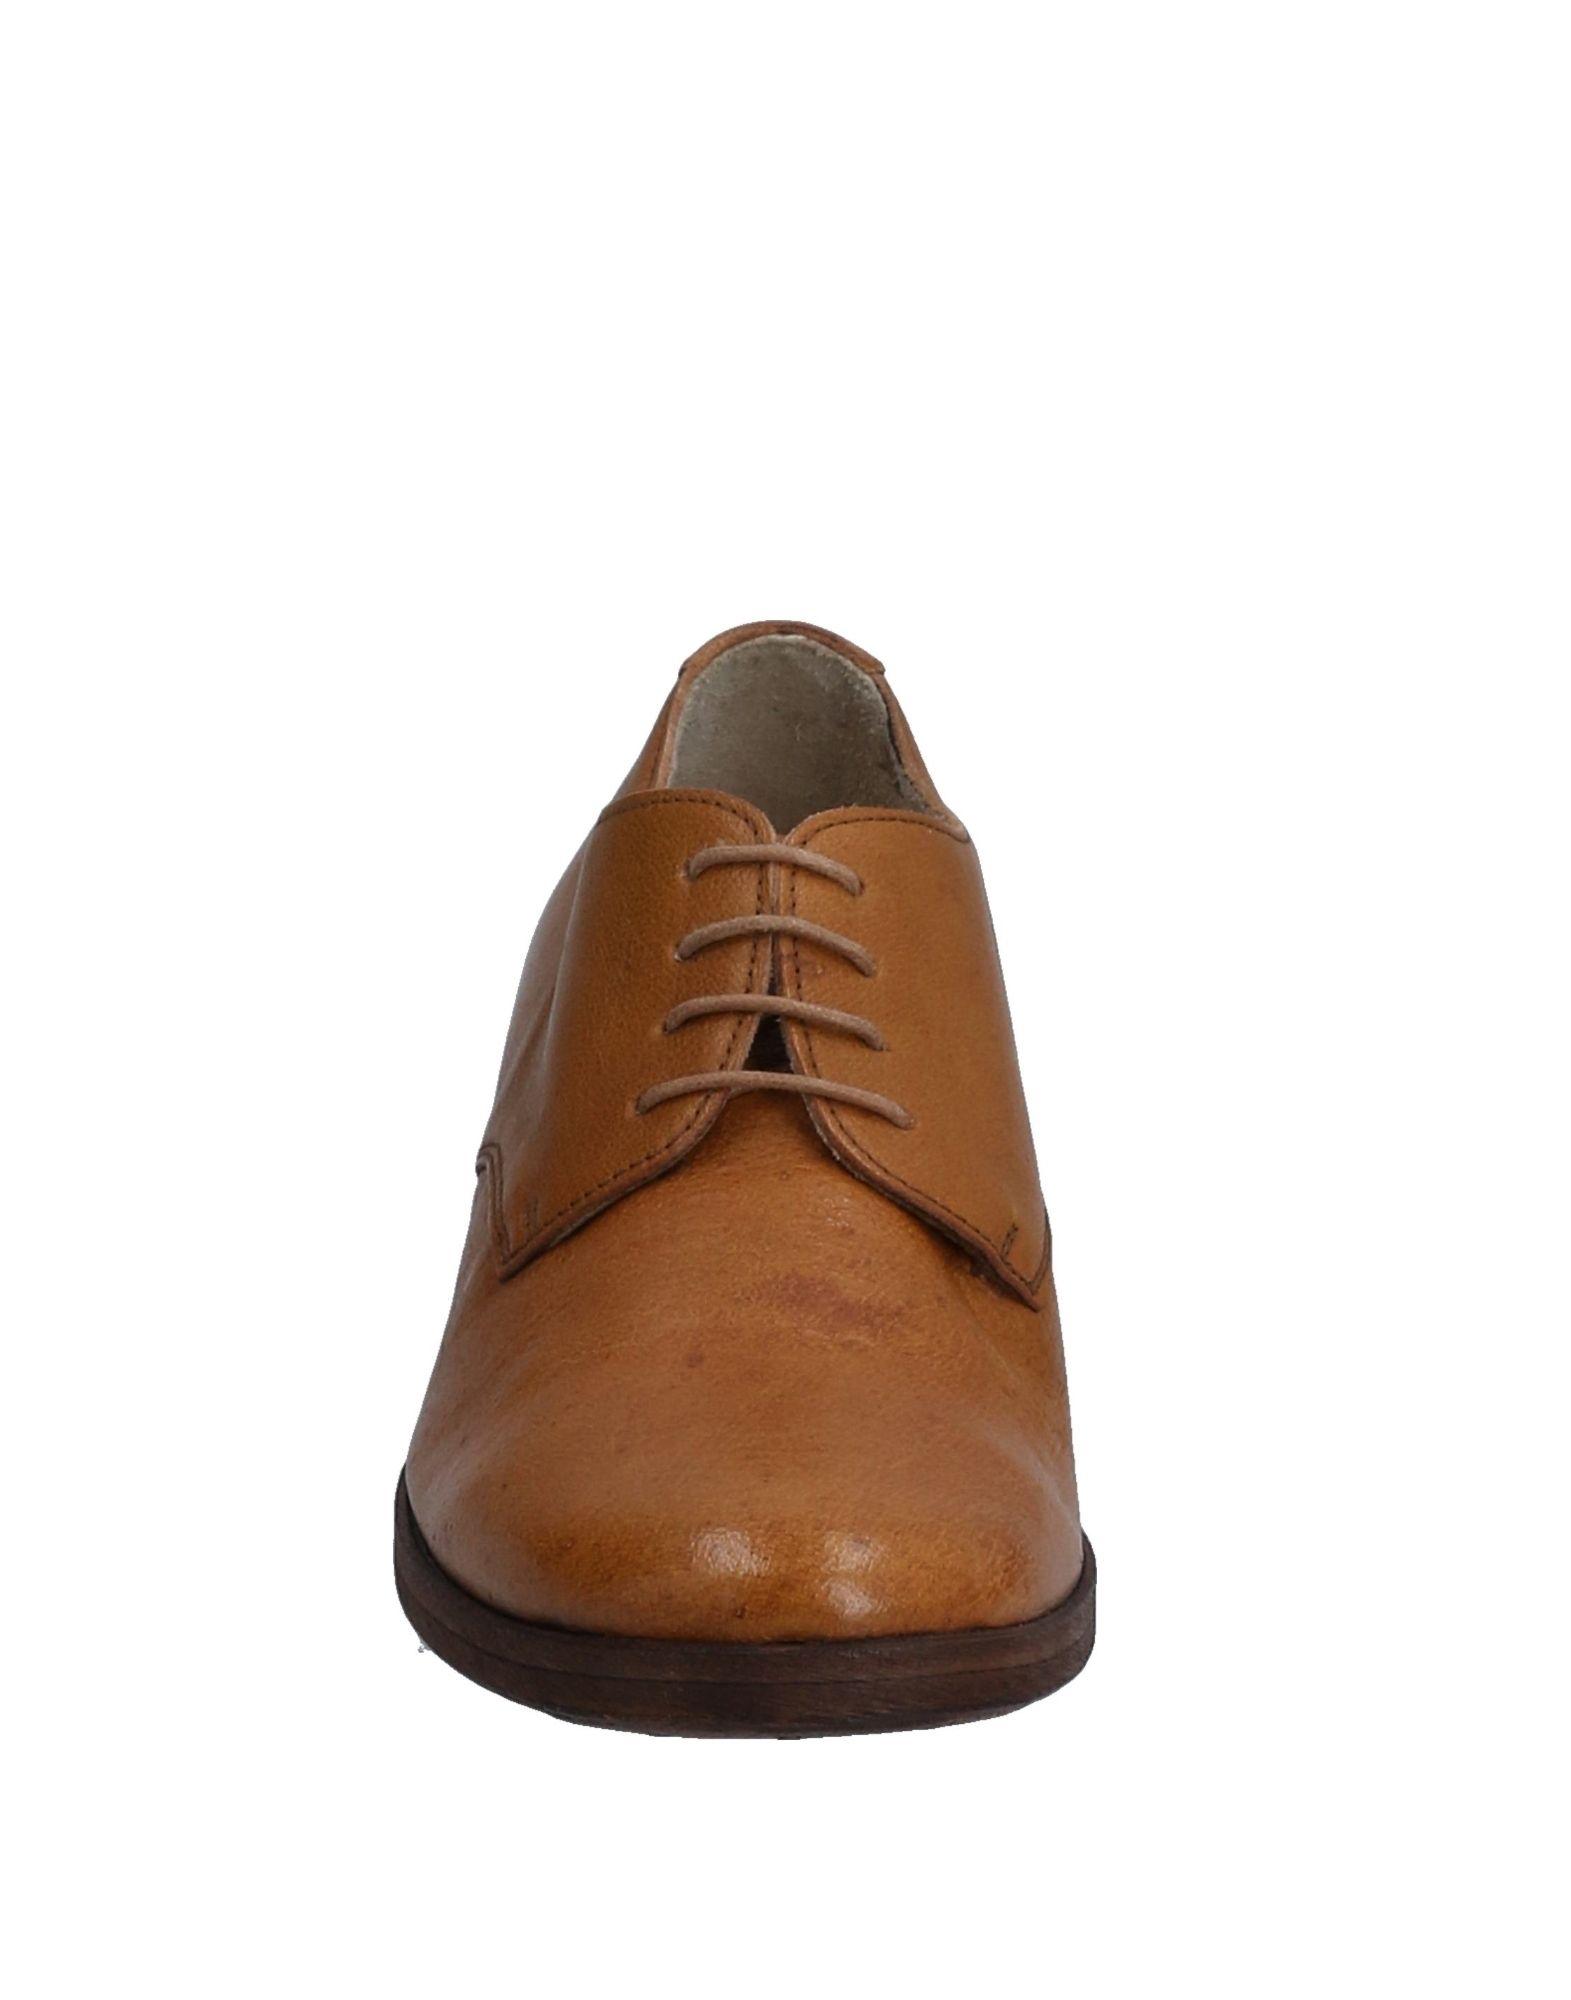 01000010 By 11528107WHGut Boccaccini Schnürschuhe Damen  11528107WHGut By aussehende strapazierfähige Schuhe 68d5eb